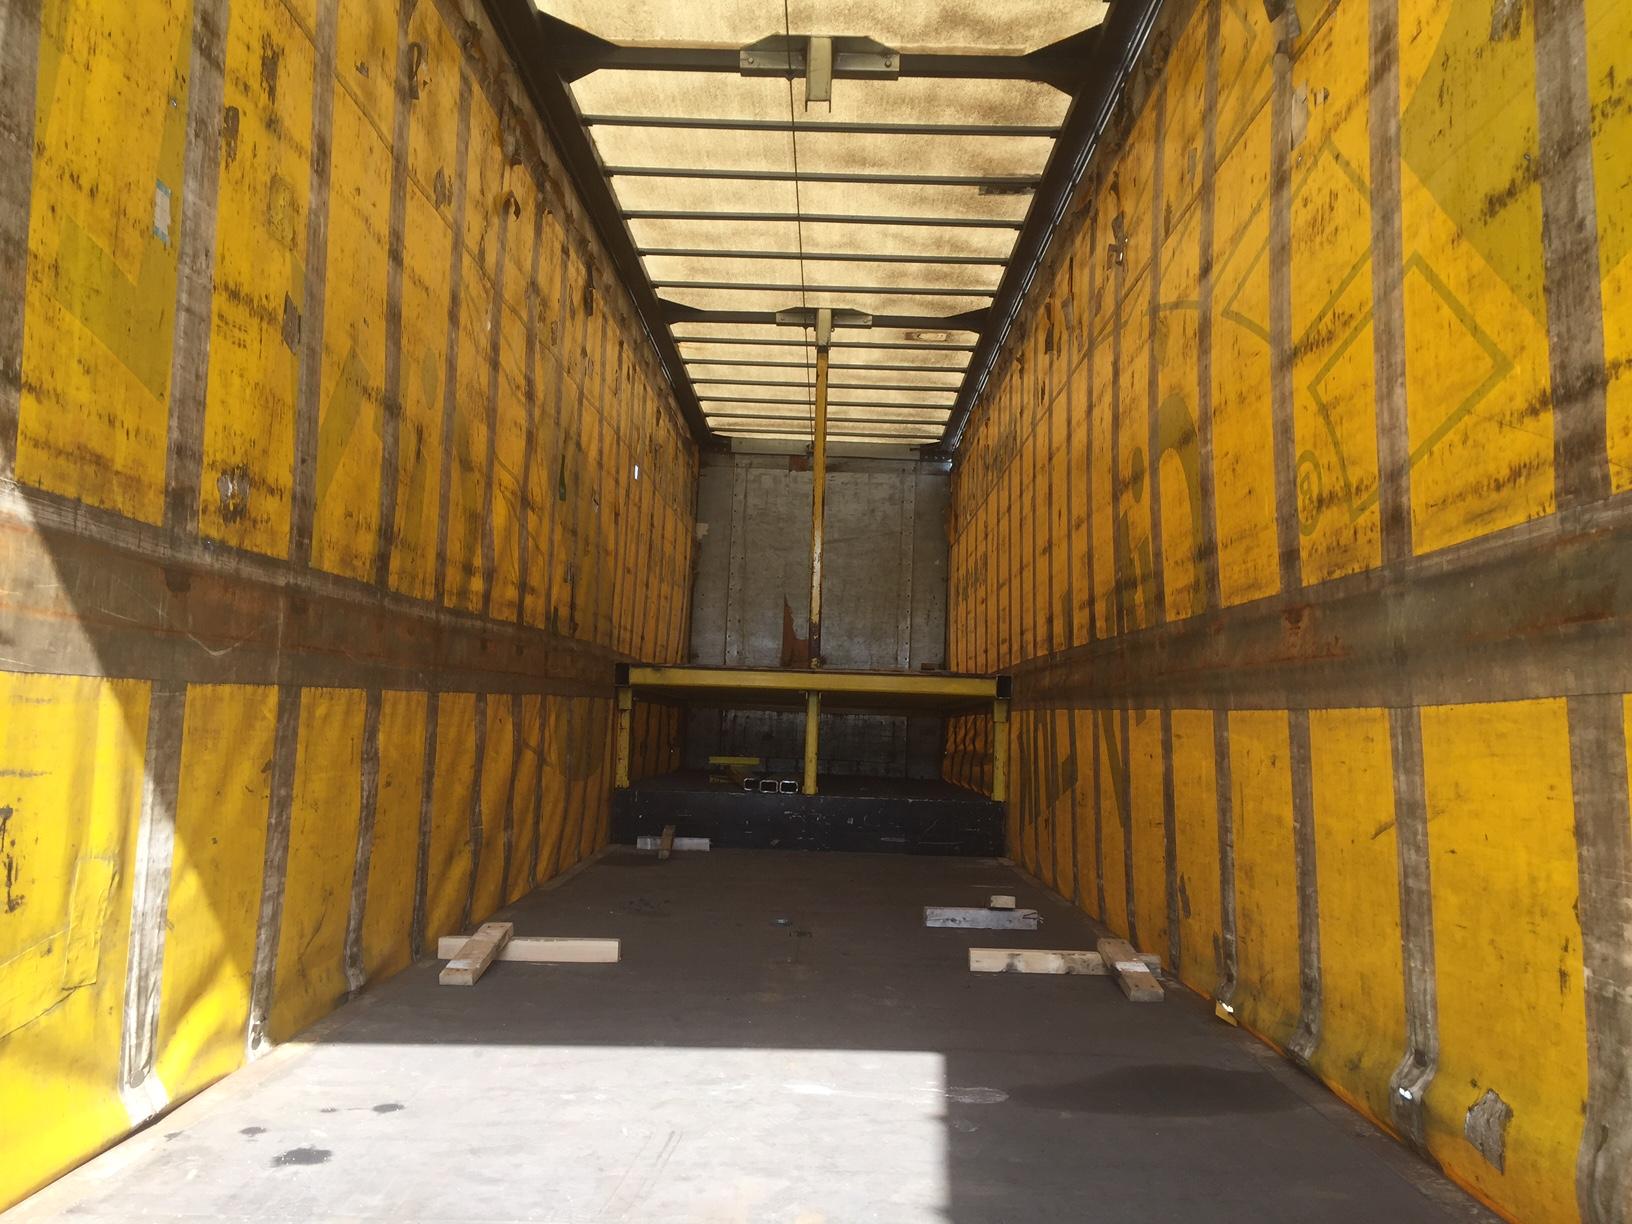 Cs1 Pavlos Zenonos General Motors Used Vans Trucks For Sale In Cyprus Limassol Nicosia